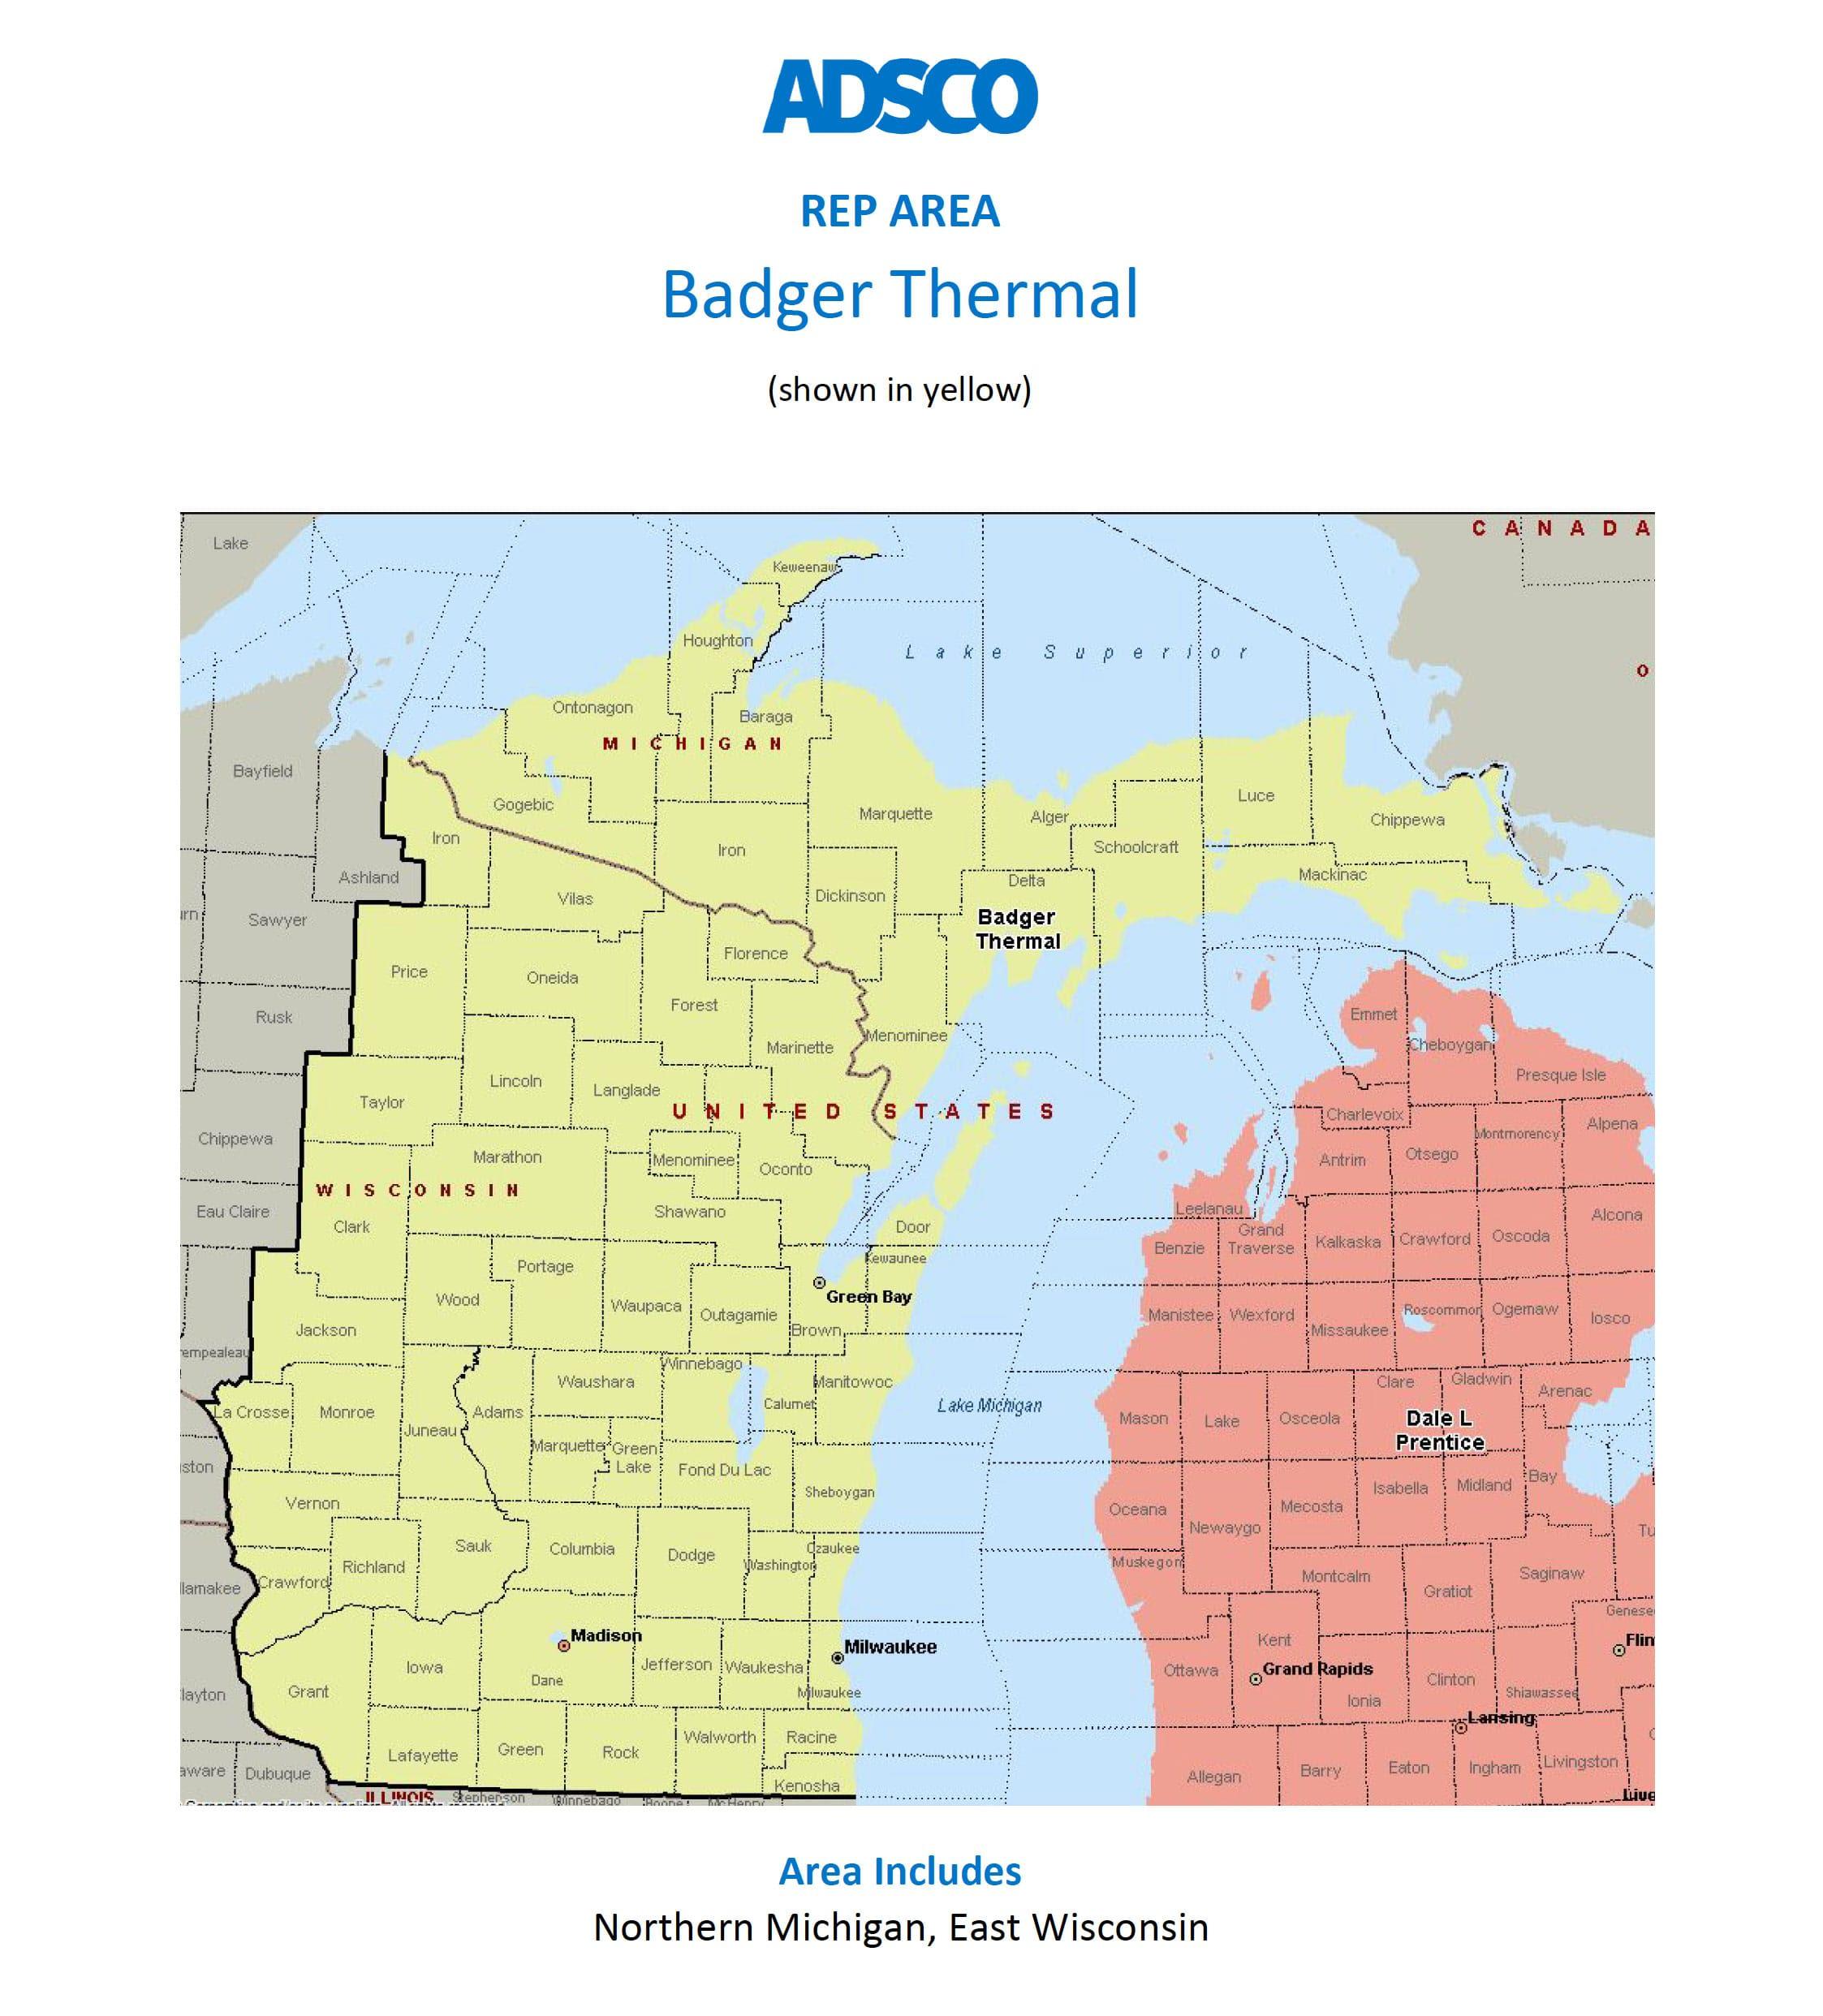 adsco michigan and wisconsin rep map